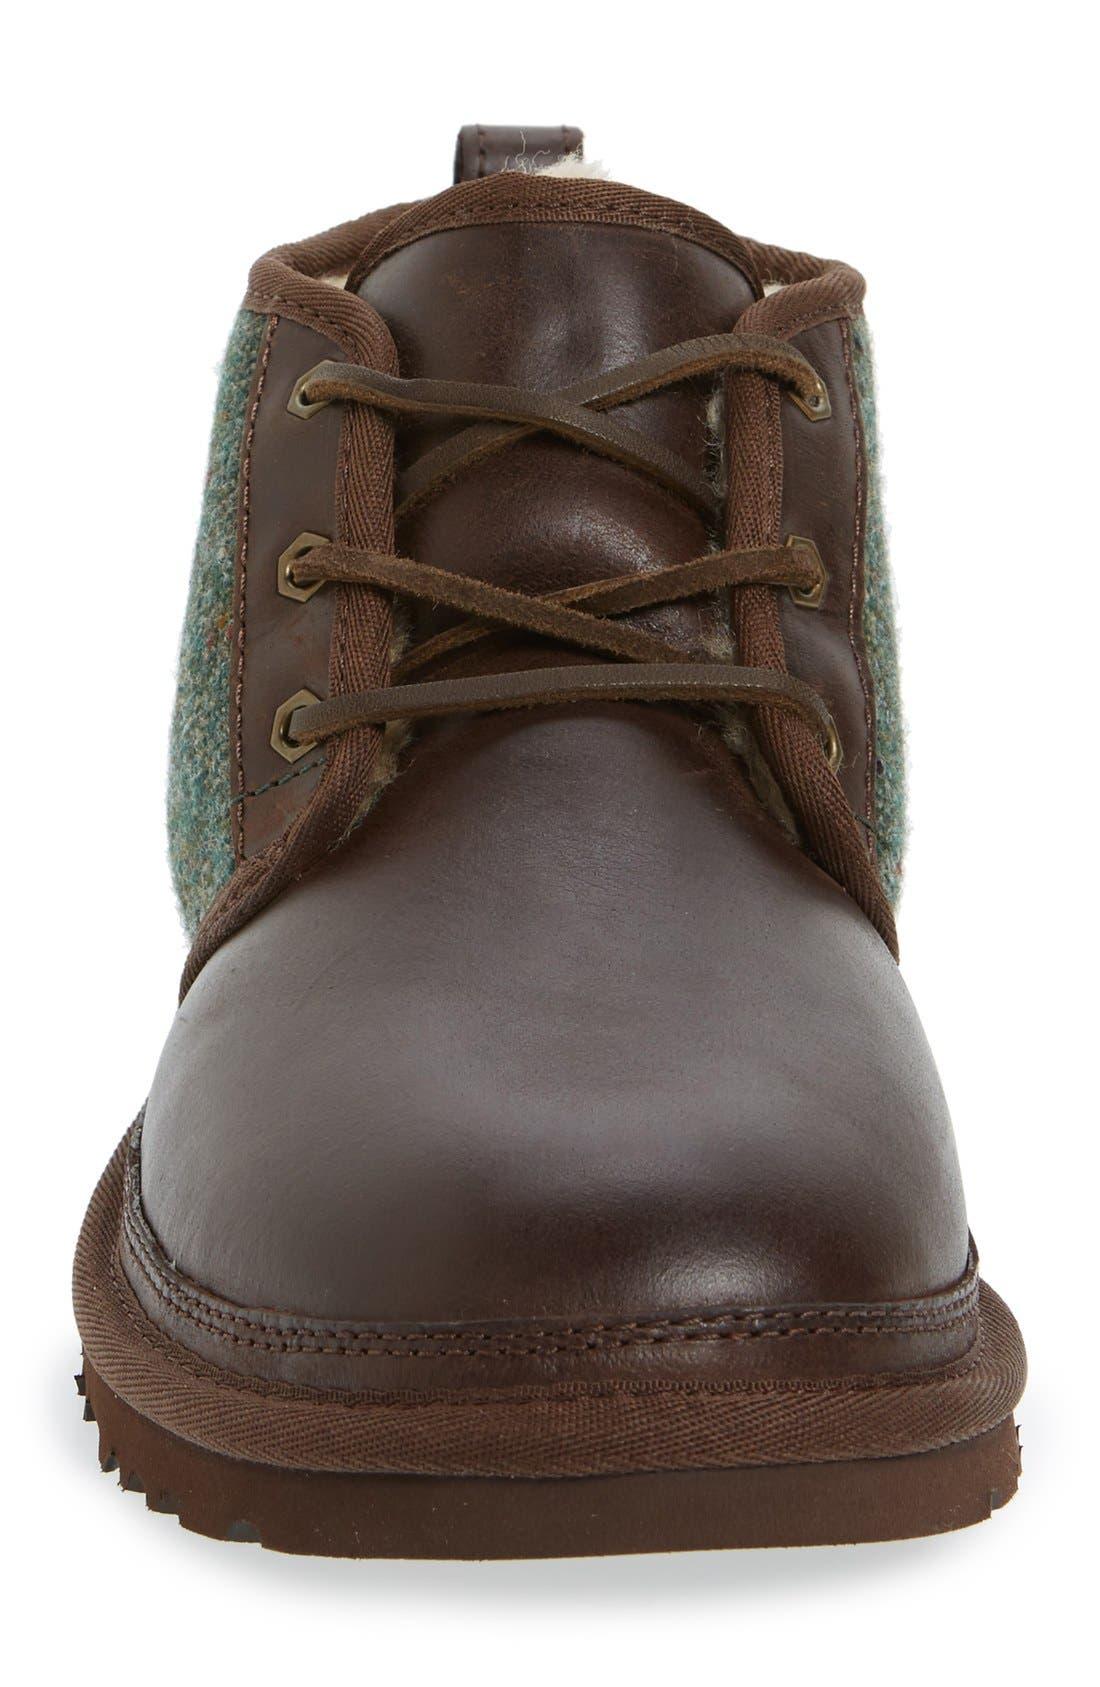 Neumel Wool & Leather Chukka Boot,                             Alternate thumbnail 3, color,                             207